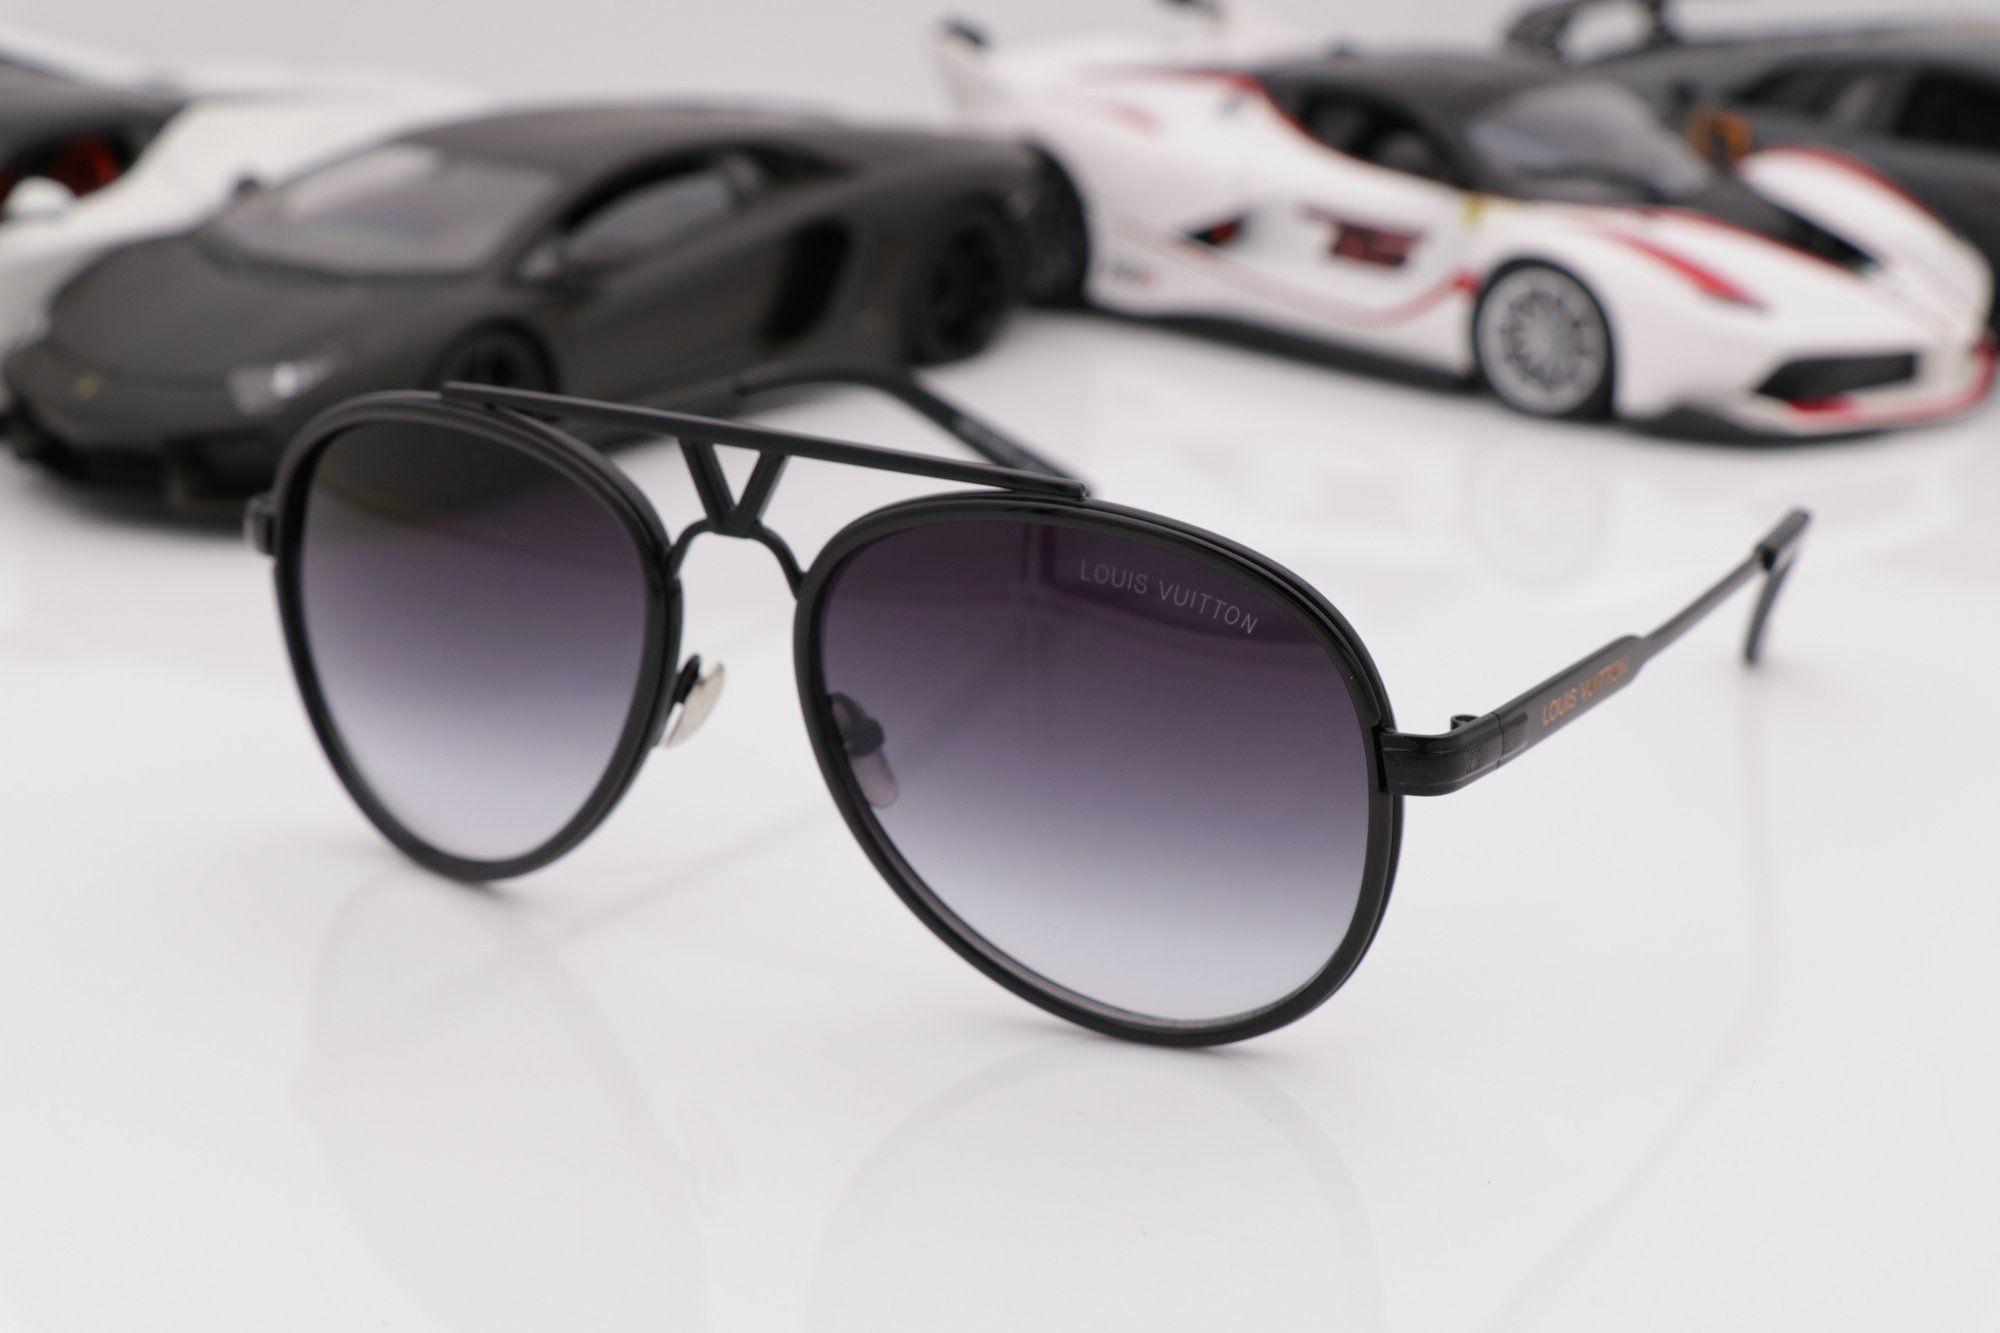 c936e4eb005a Hot men brand designer sunglasses women millionaire evidence jpg 2000x1333 Louis  vuitton millionaire sunglasses china